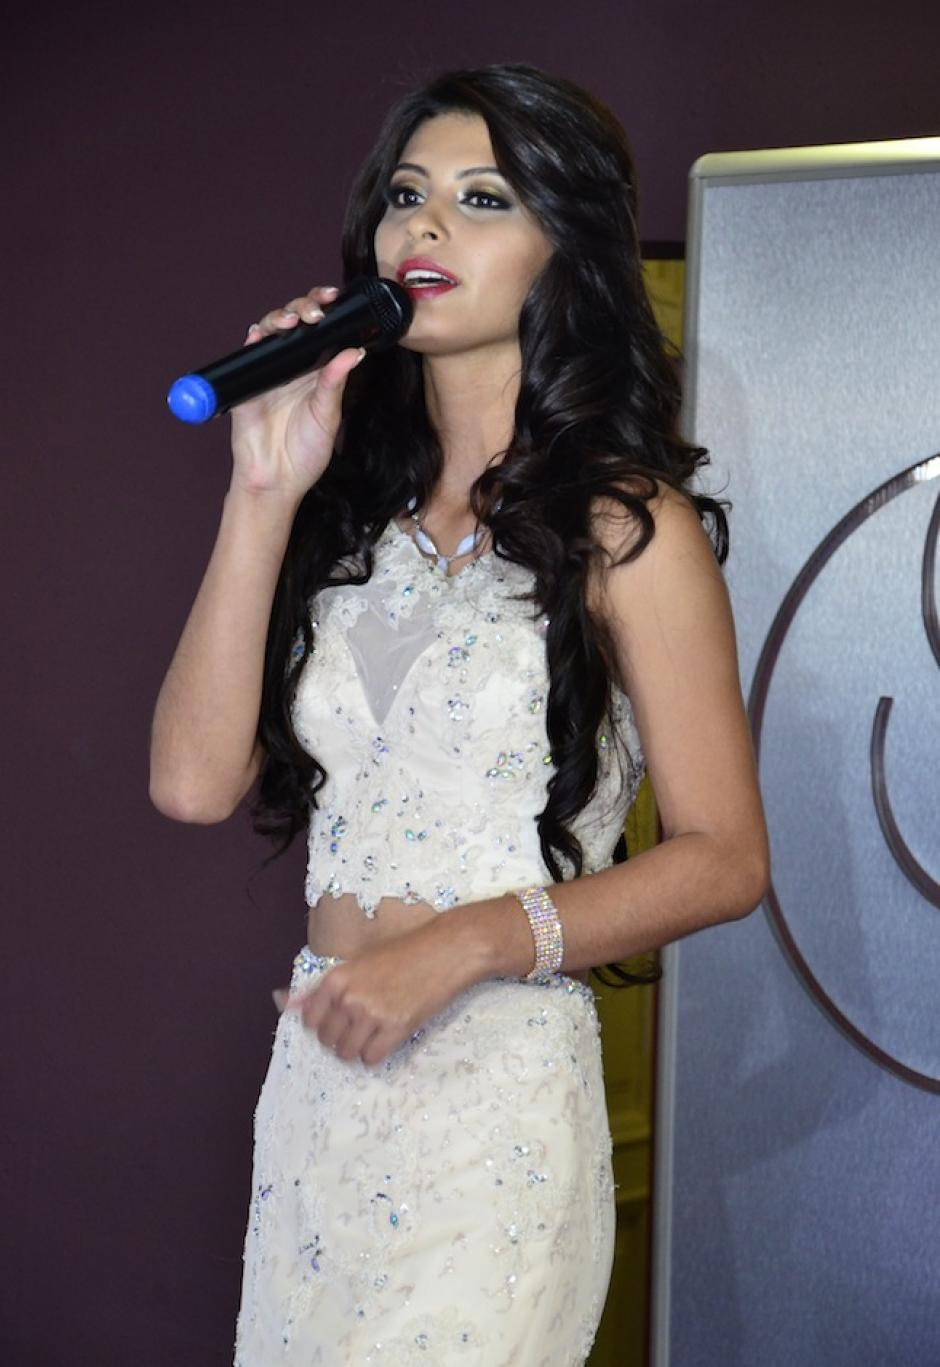 Santa Rosa es Jennifer Sofía Alvarado. (Foto: Selene Mejía/Soy502)